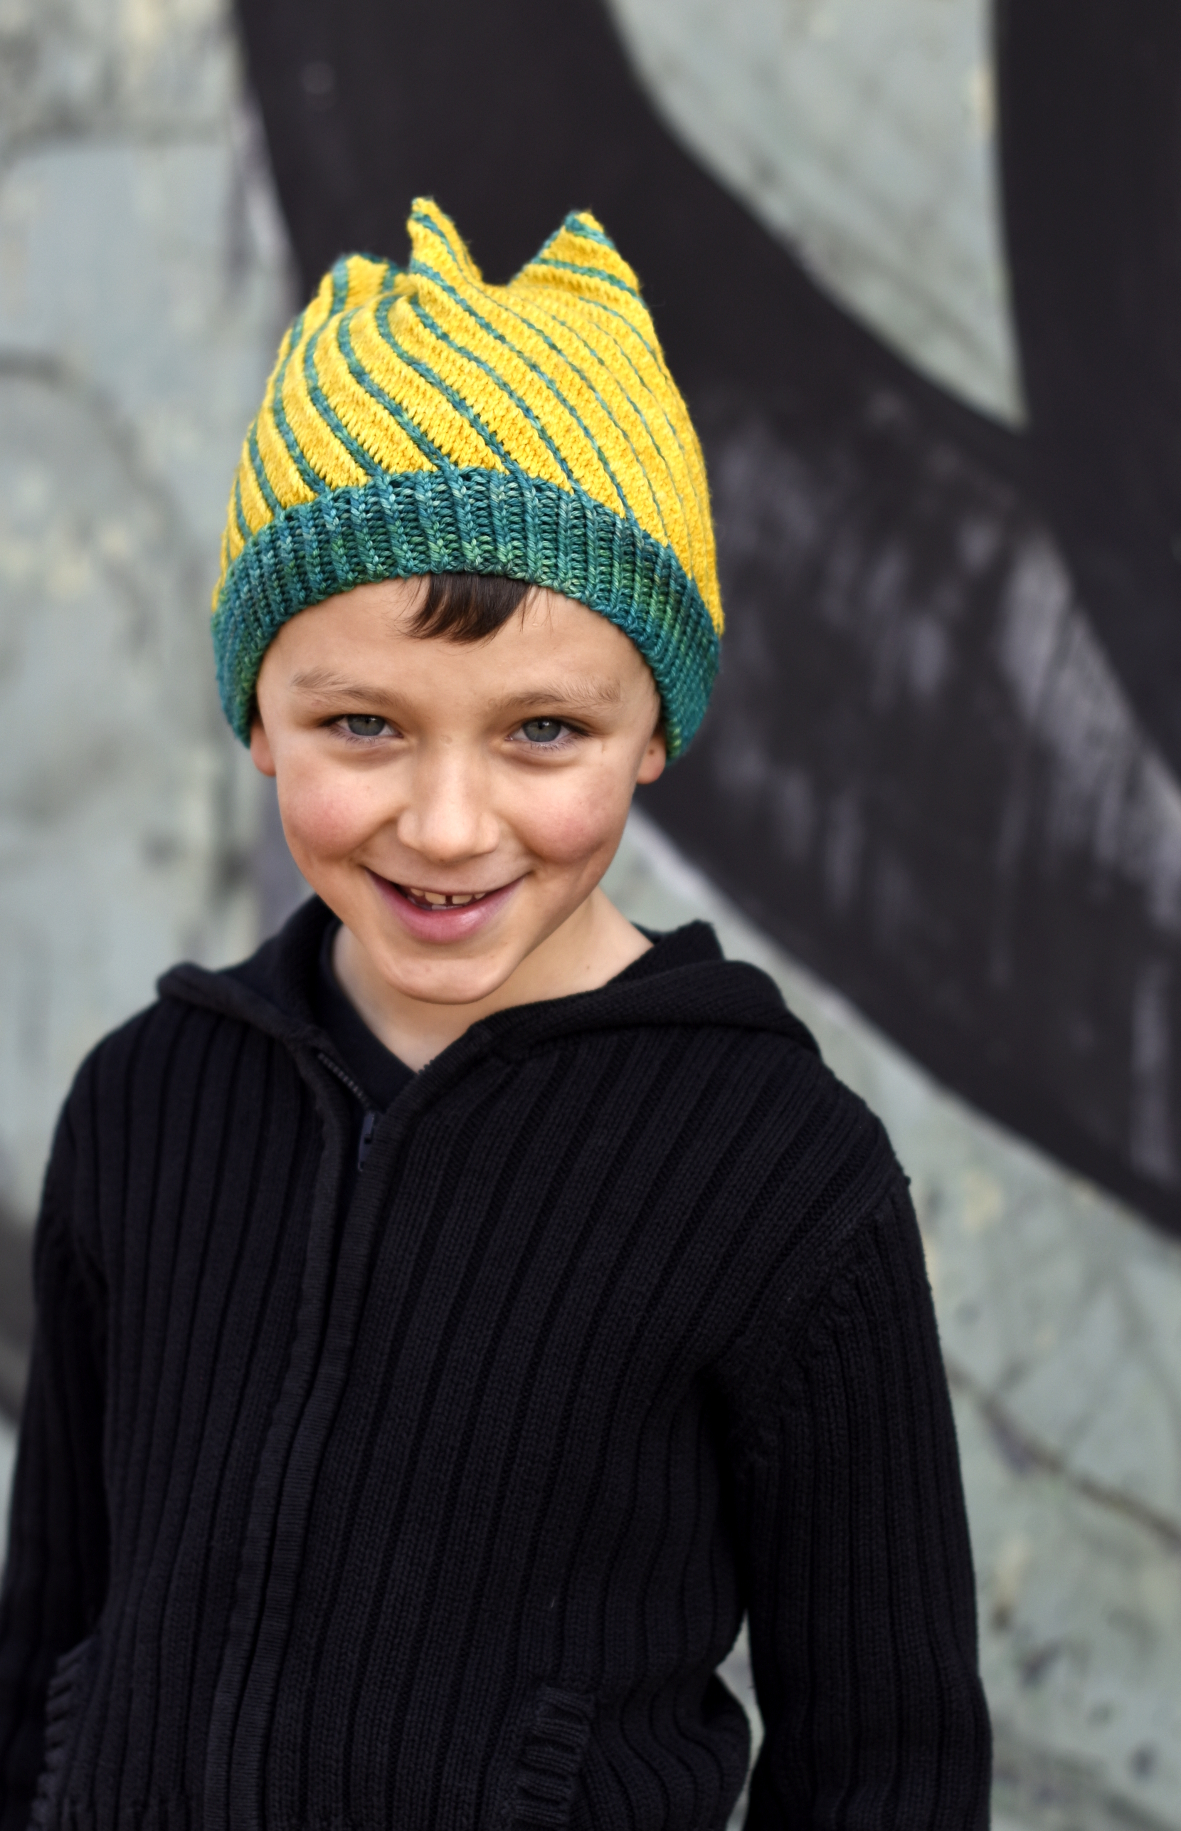 Torsione hand knitting pattern for stranded bias knit colourwork hat